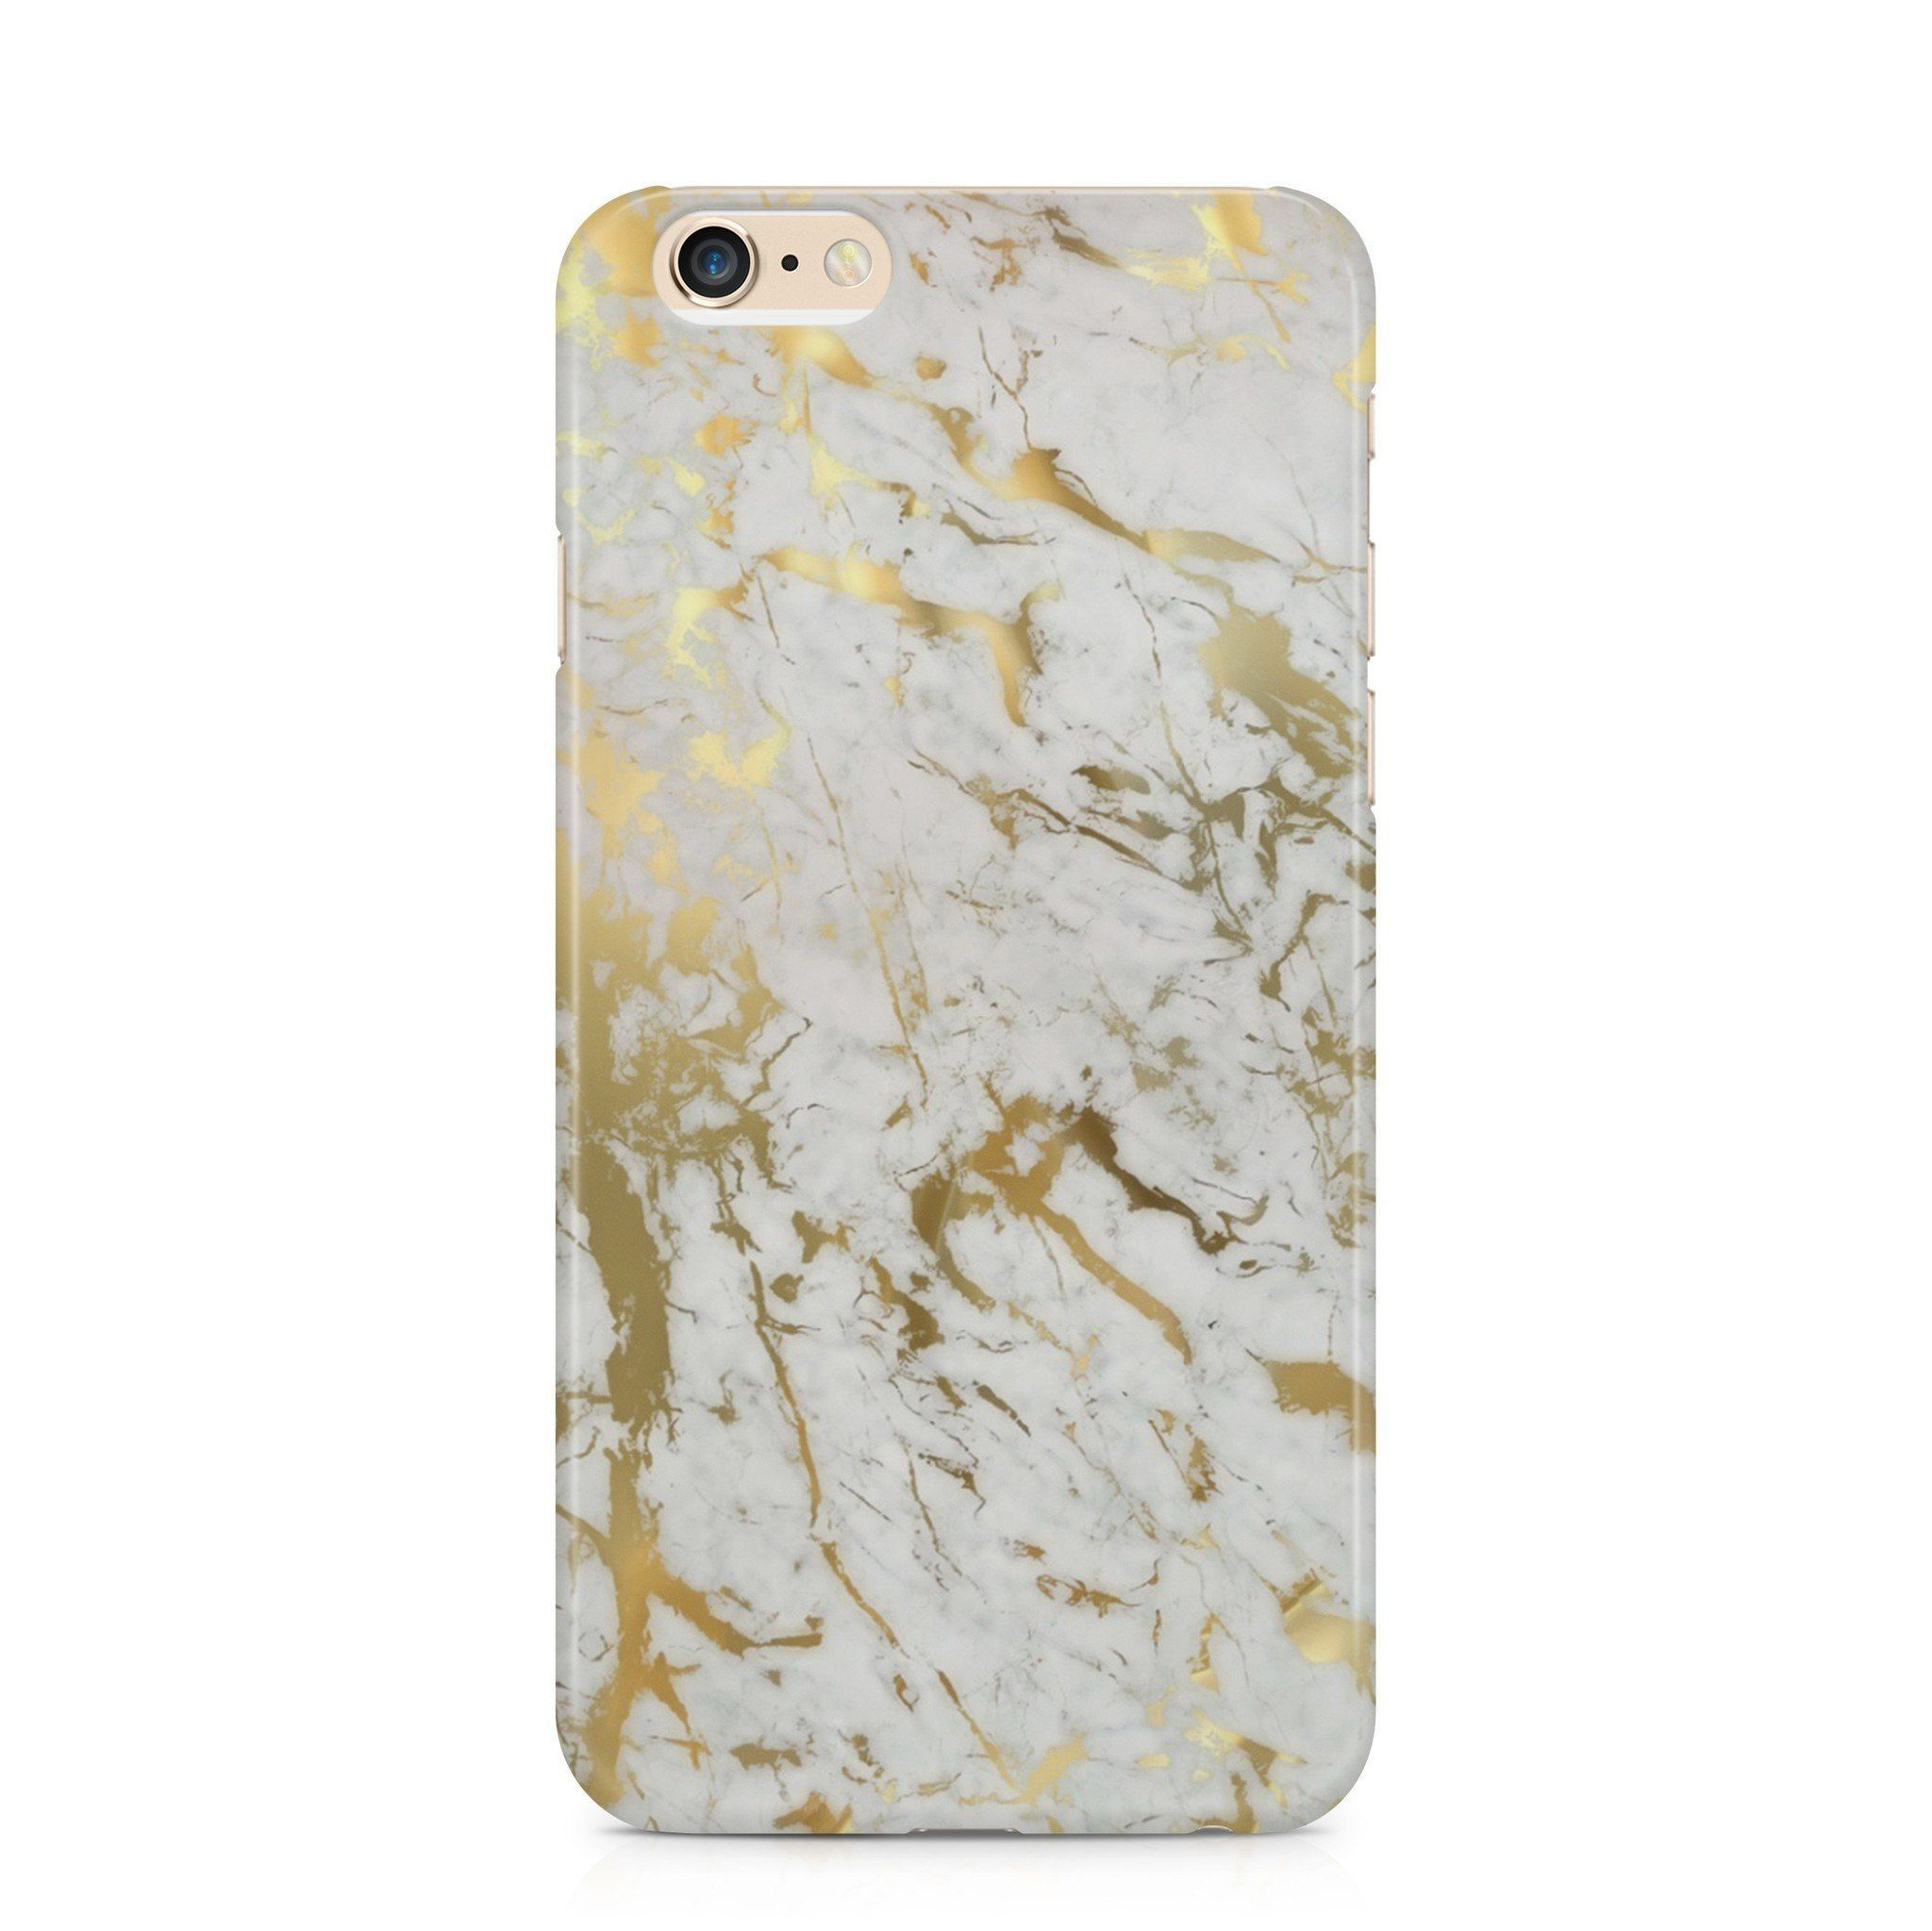 Must see Wallpaper Marble Iphone 6 - cda2307b66217279f2482b1e13c83428  Trends_807753.jpg